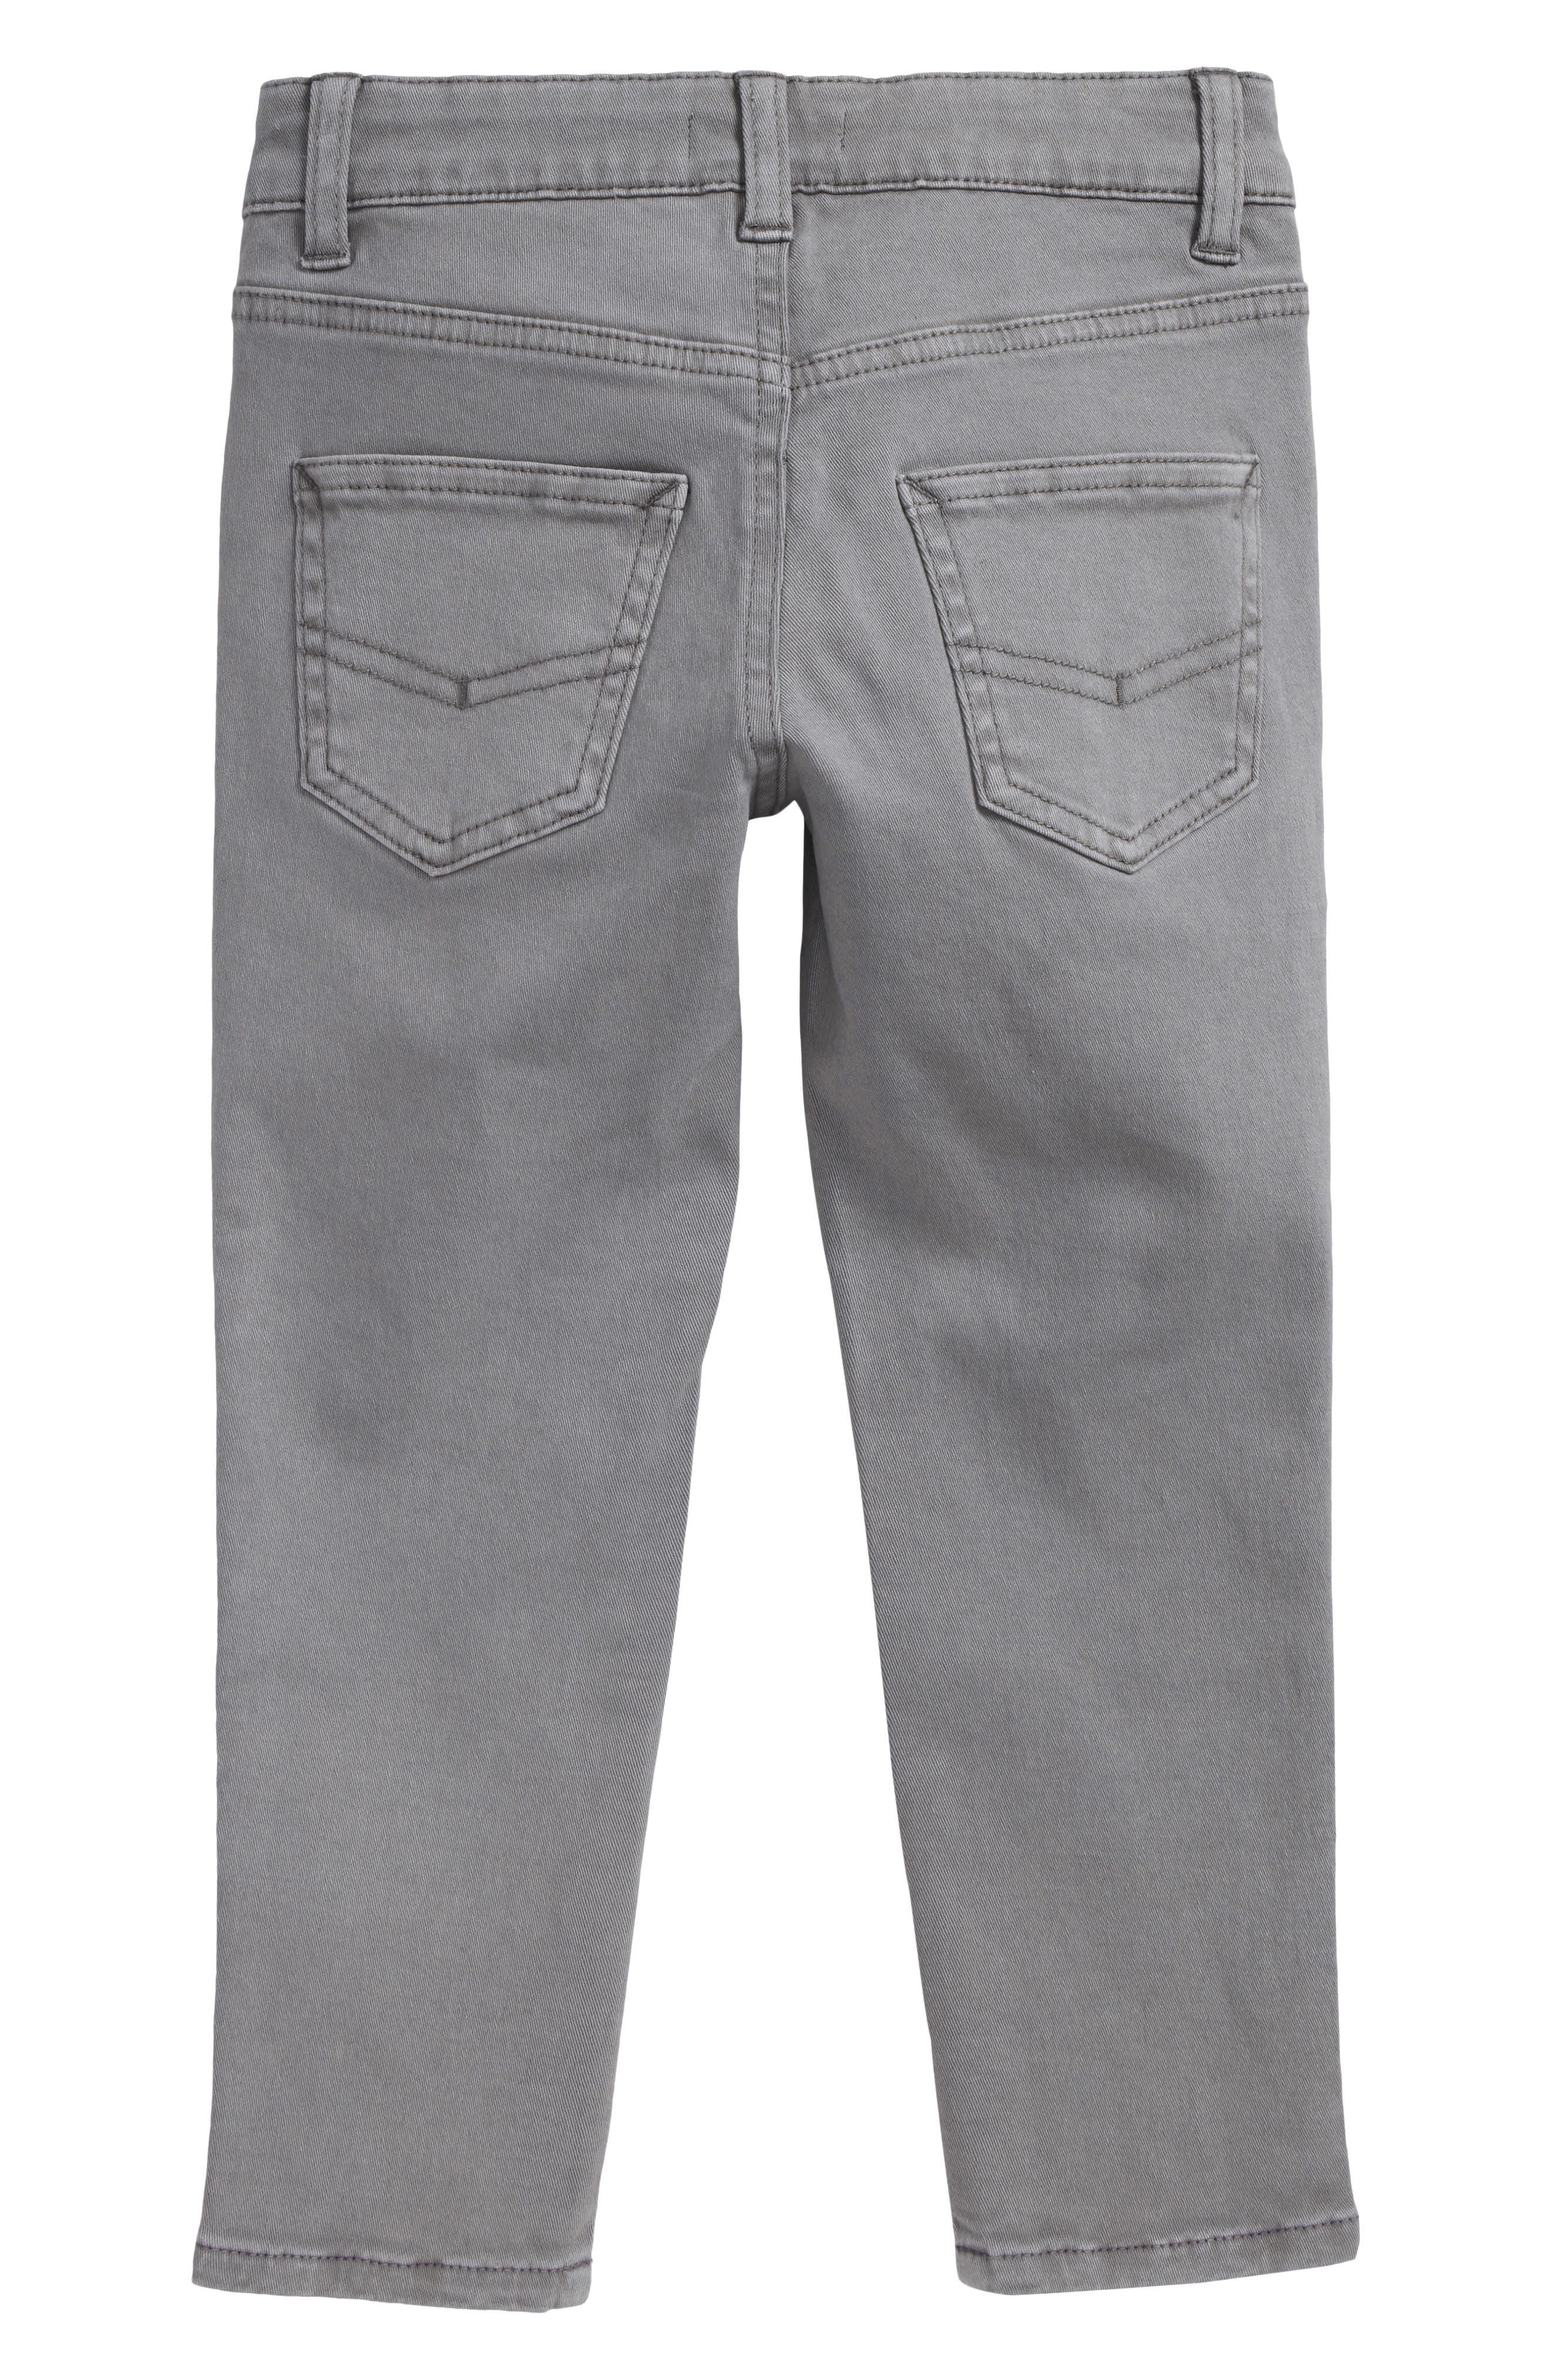 TUCKER + TATE, Stretch Chino Pants, Alternate thumbnail 2, color, 030